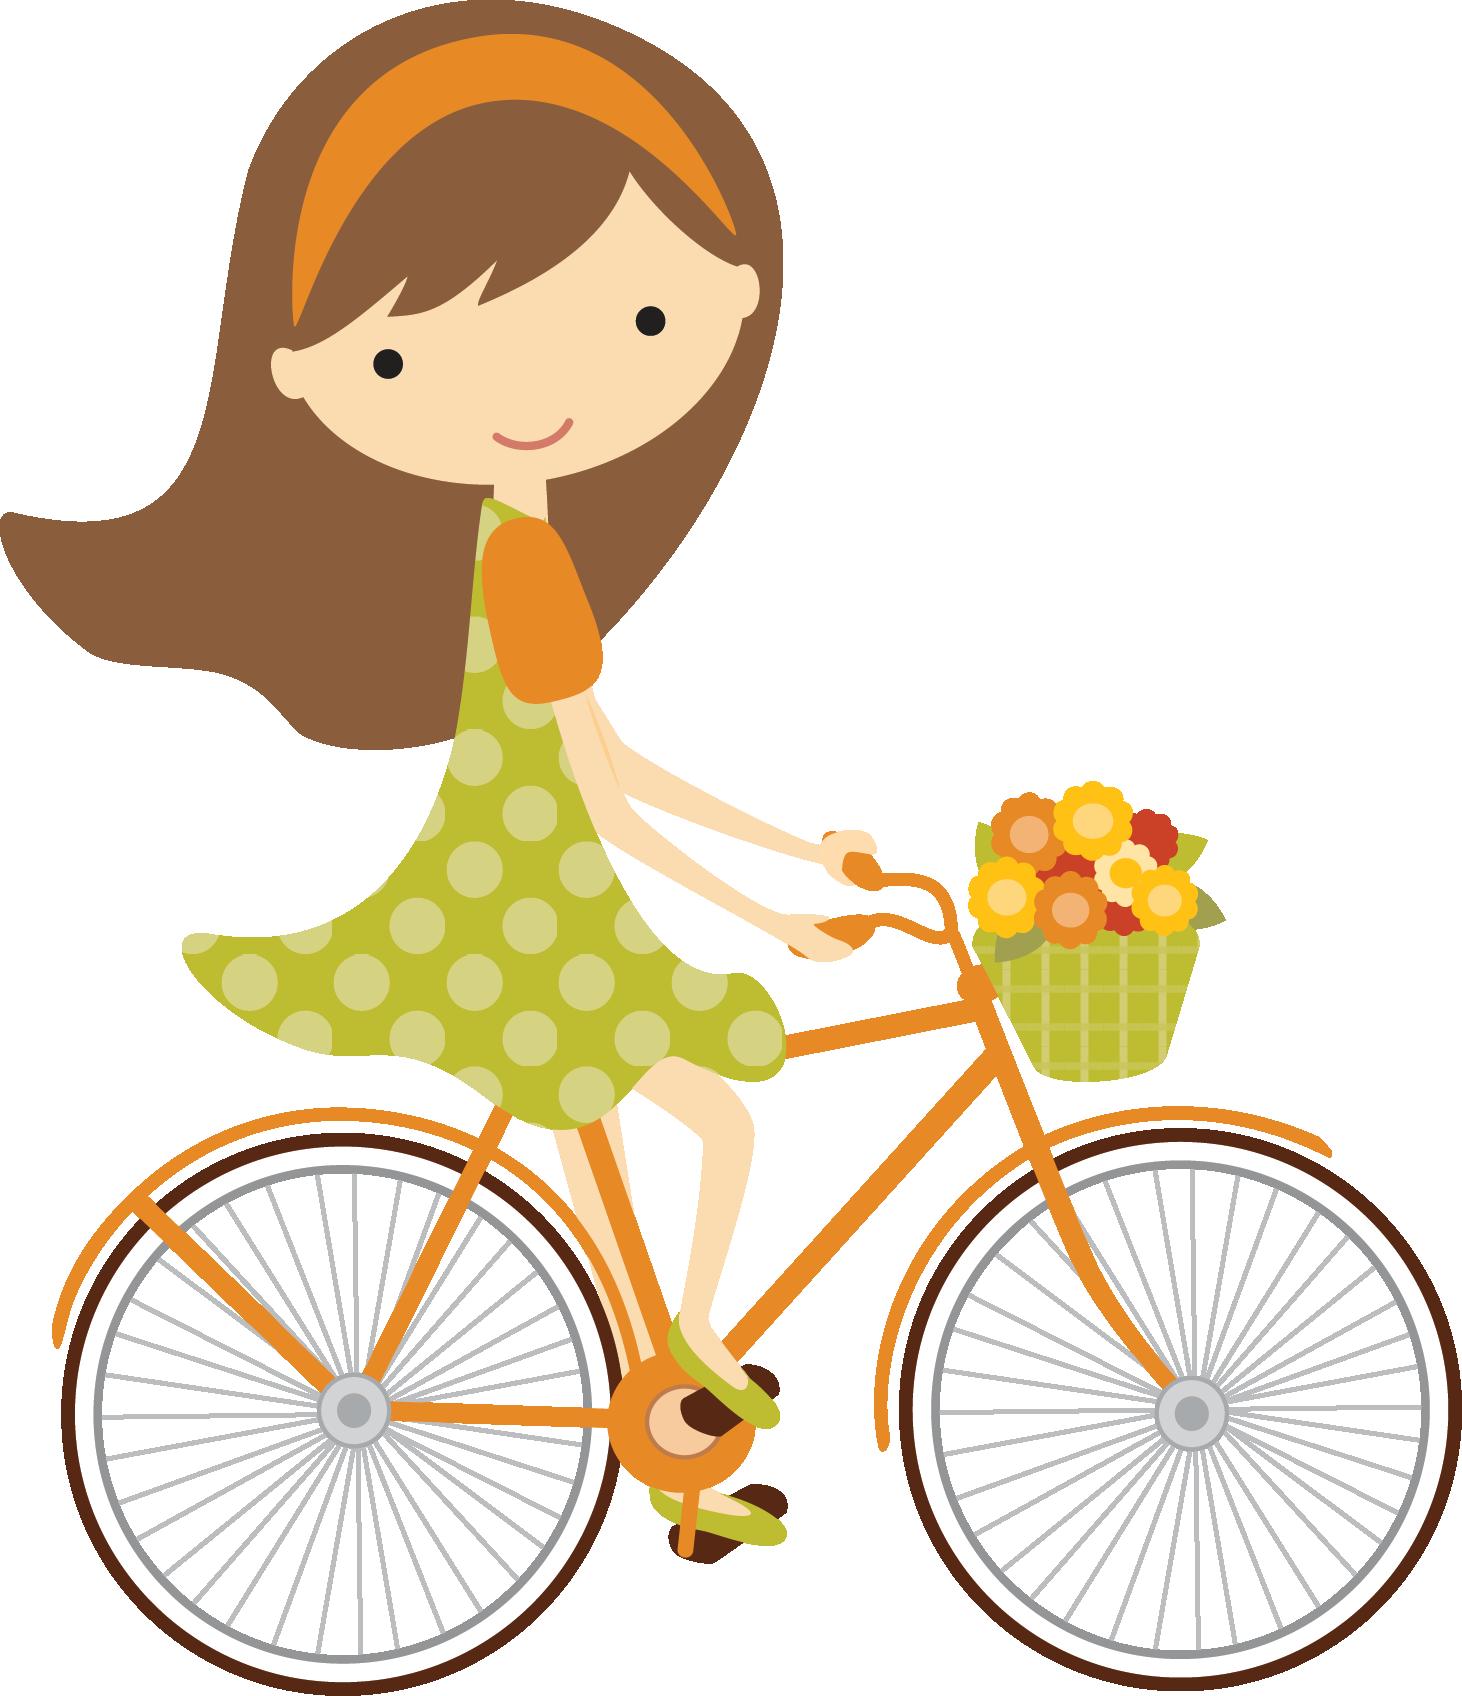 Ladybugs clipart cycle. Bicicleta fallgirlbrown png minus